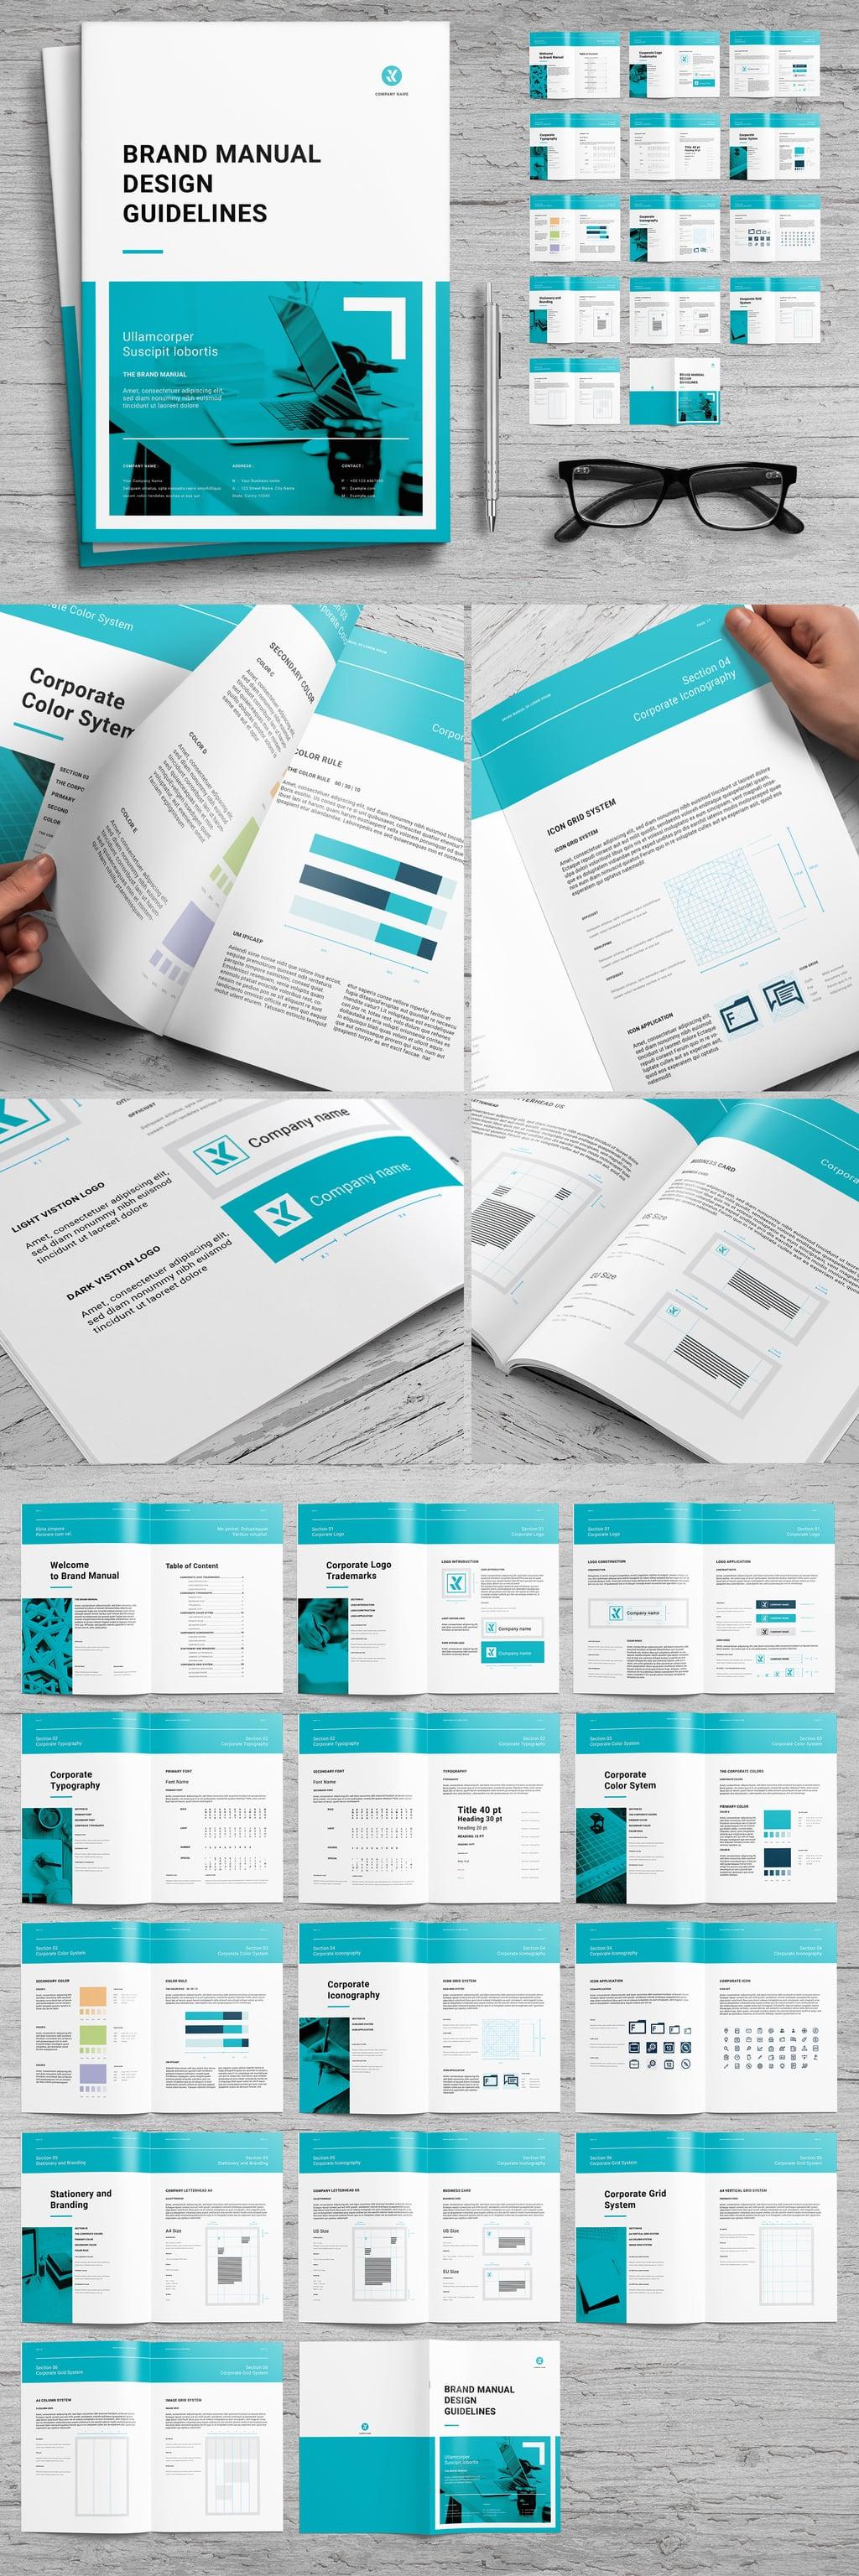 Brand Guideline Landscape Layout